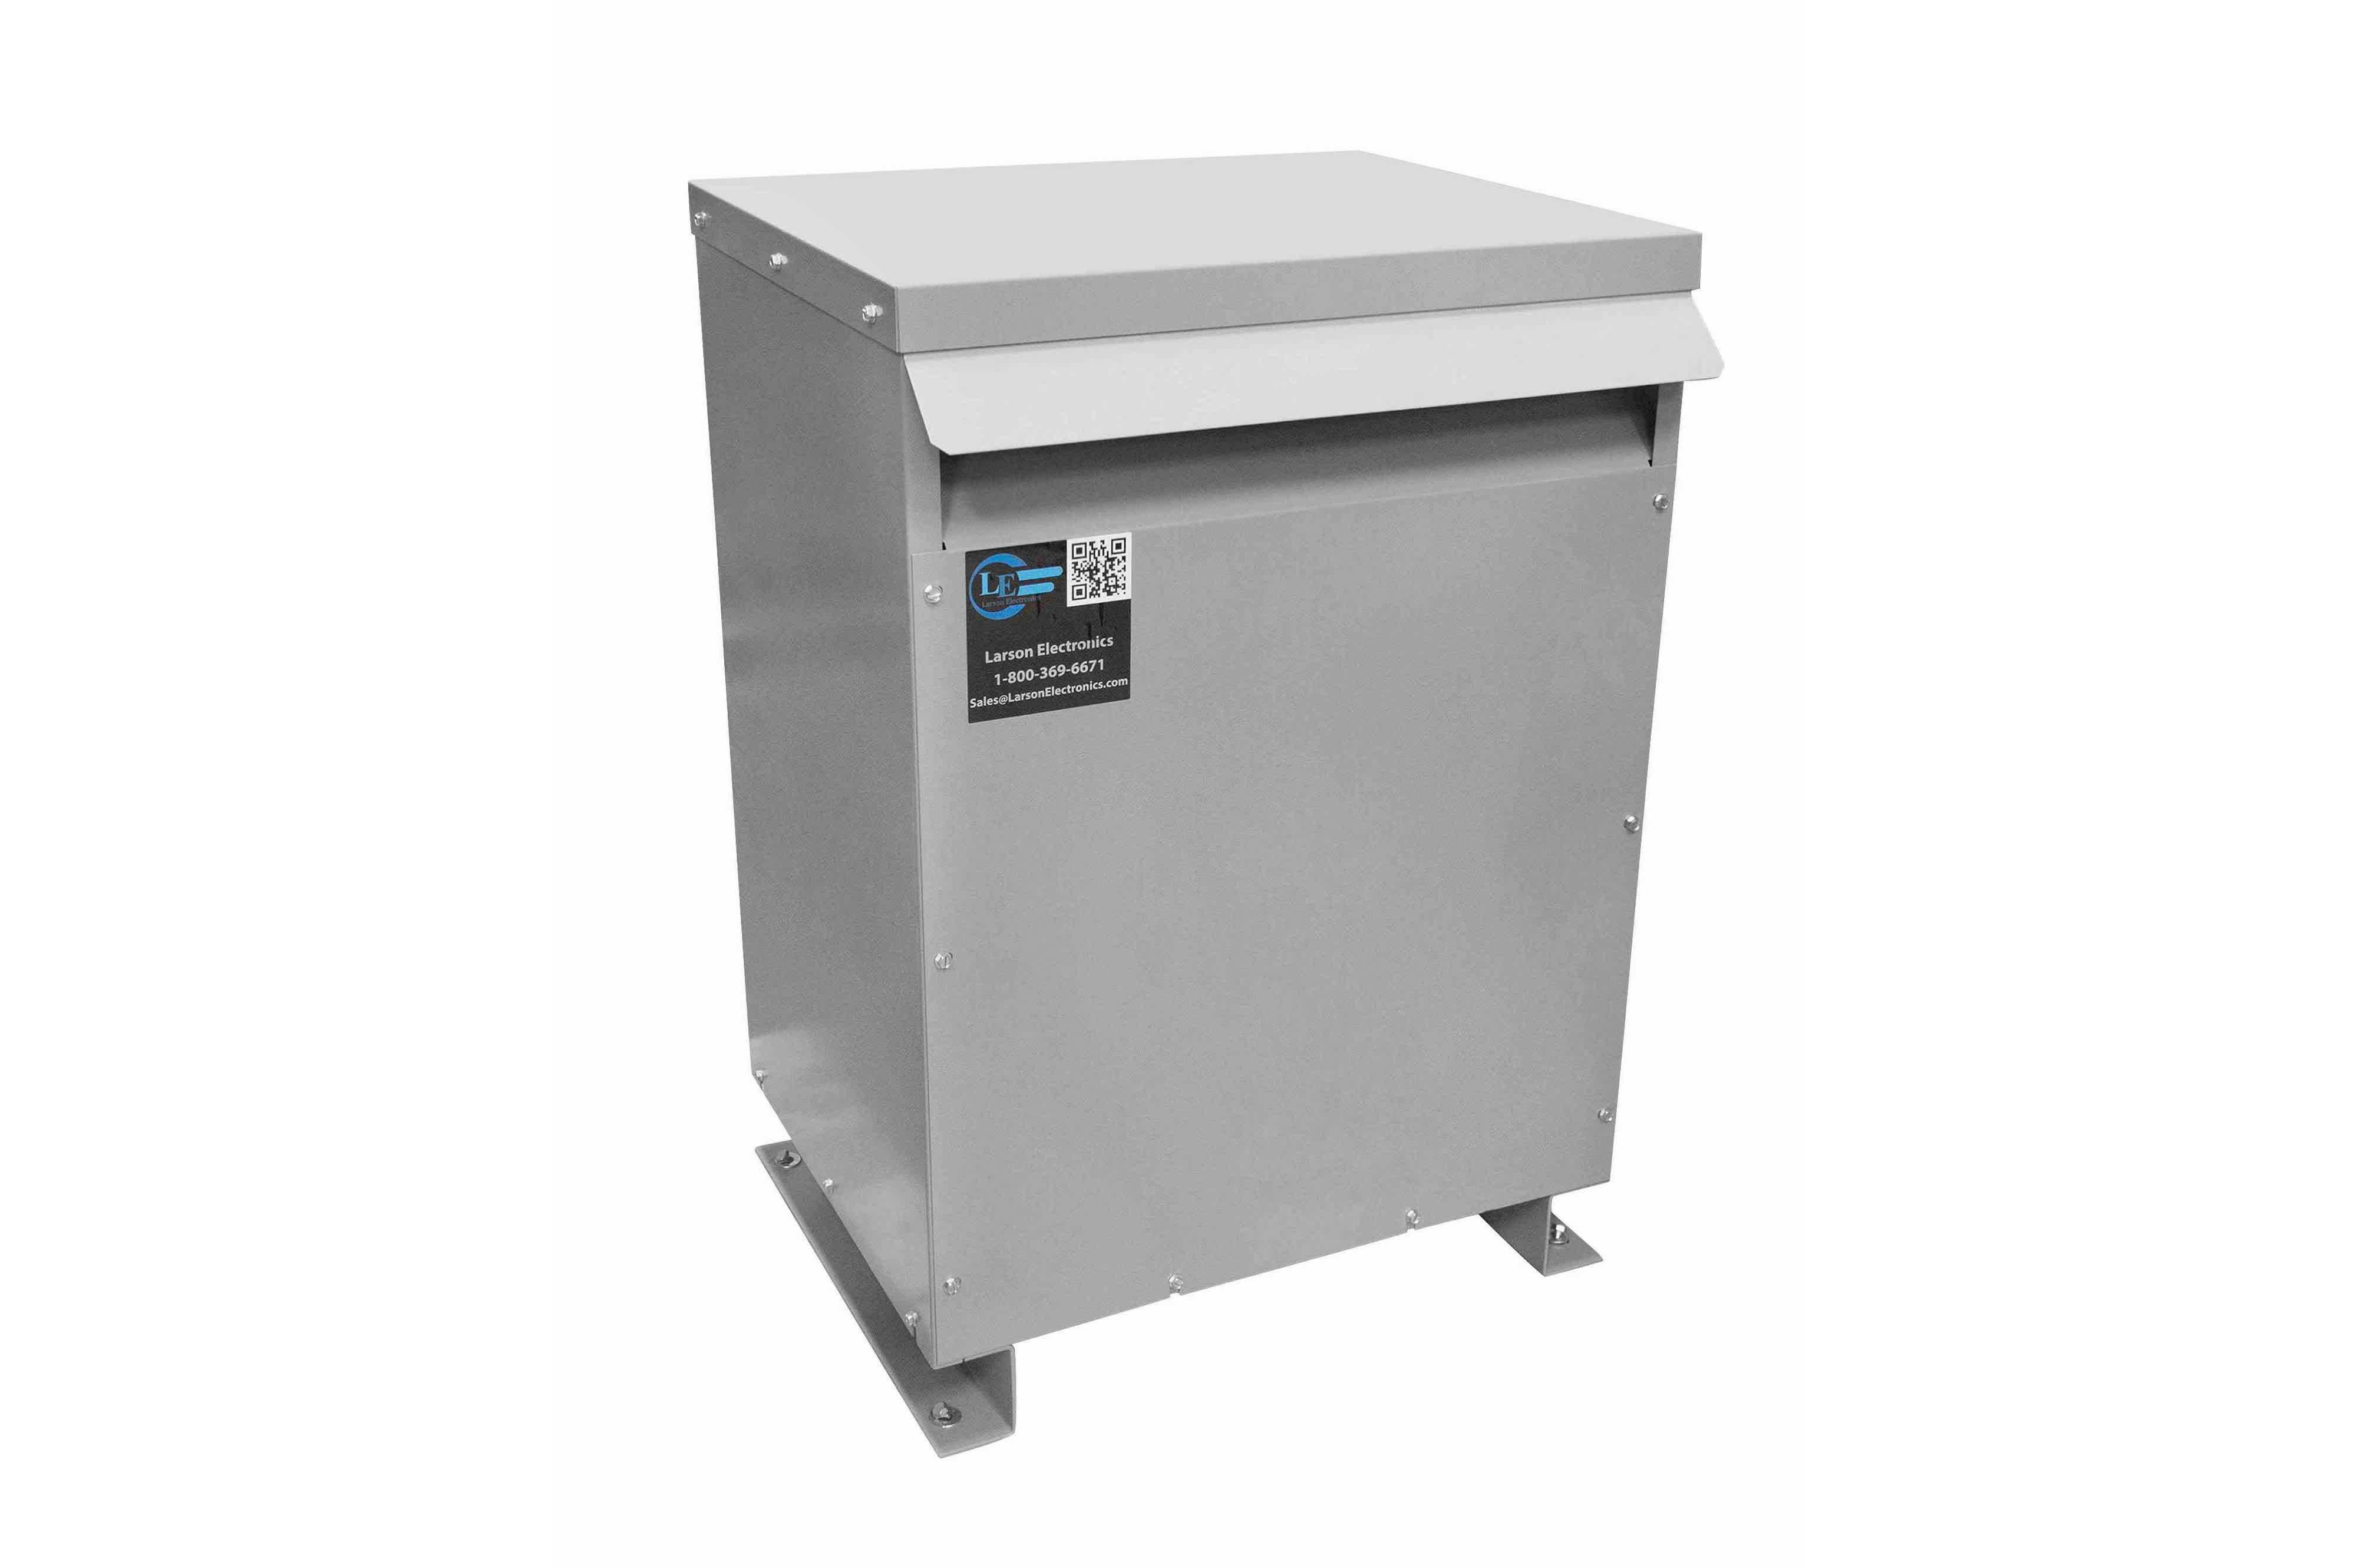 27 kVA 3PH Isolation Transformer, 220V Wye Primary, 208Y/120 Wye-N Secondary, N3R, Ventilated, 60 Hz